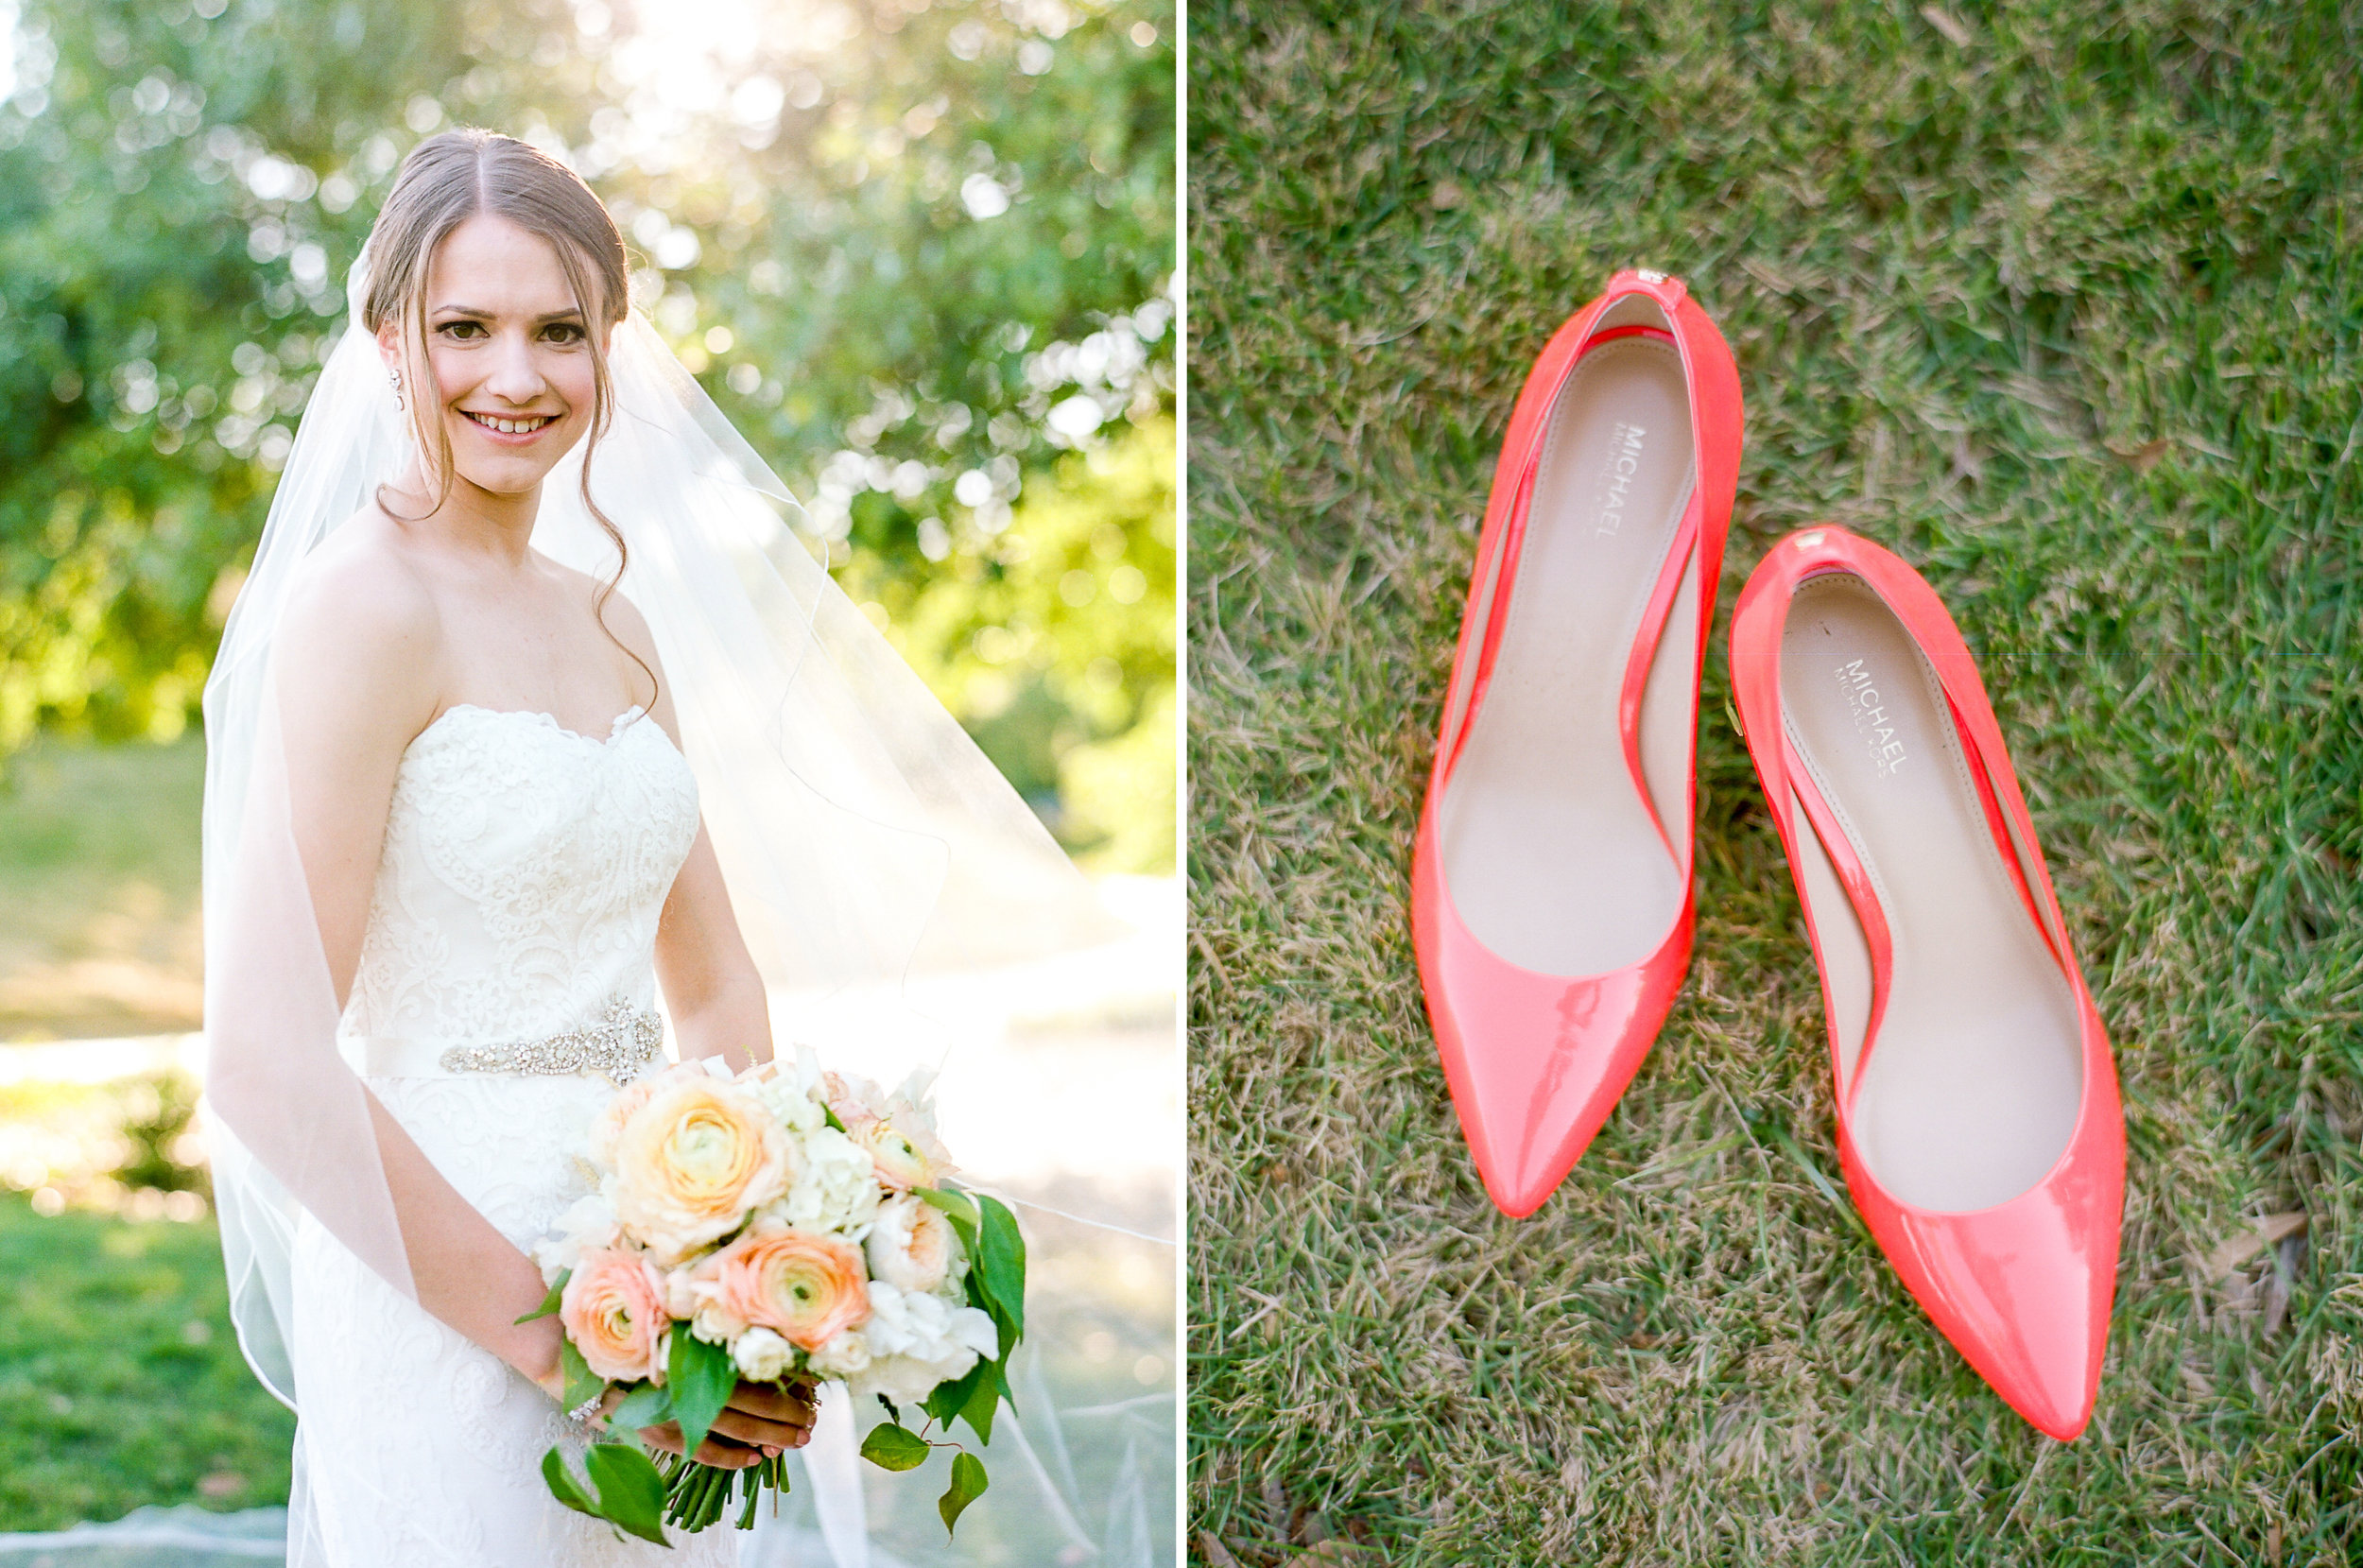 Houston-Wedding-Photographer-Film-Fine-Art-Bridals-Dana Fernandez-Photography-102.jpg